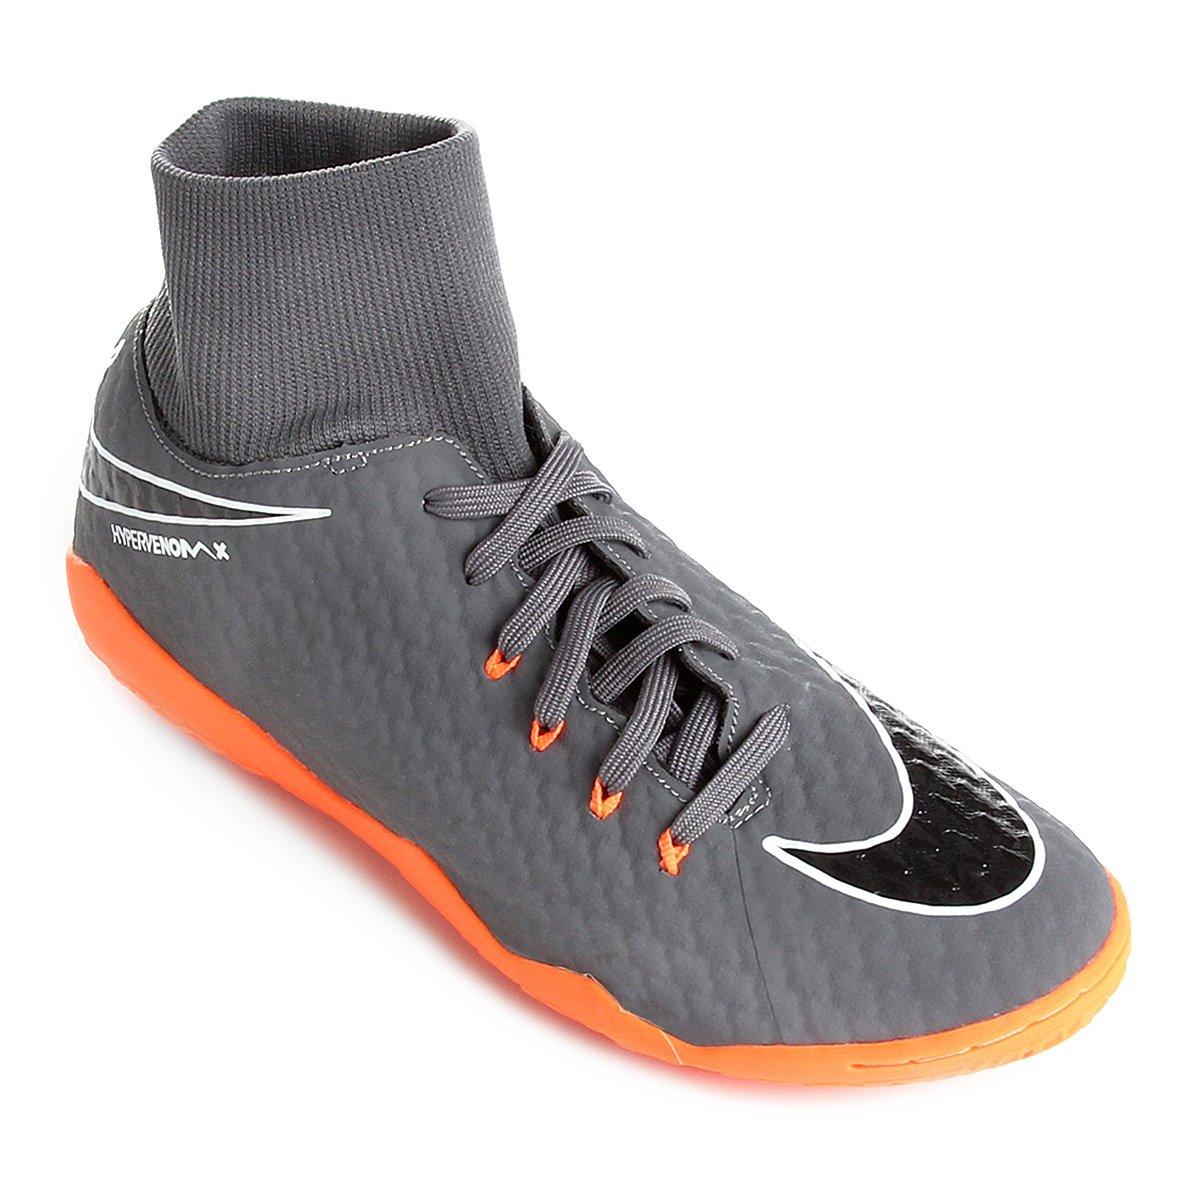 8b36c8051d270 Chuteira Futsal Nike Hypervenom Phantom 3 Academy DF IC - Cinza e Laranja |  Shop Timão